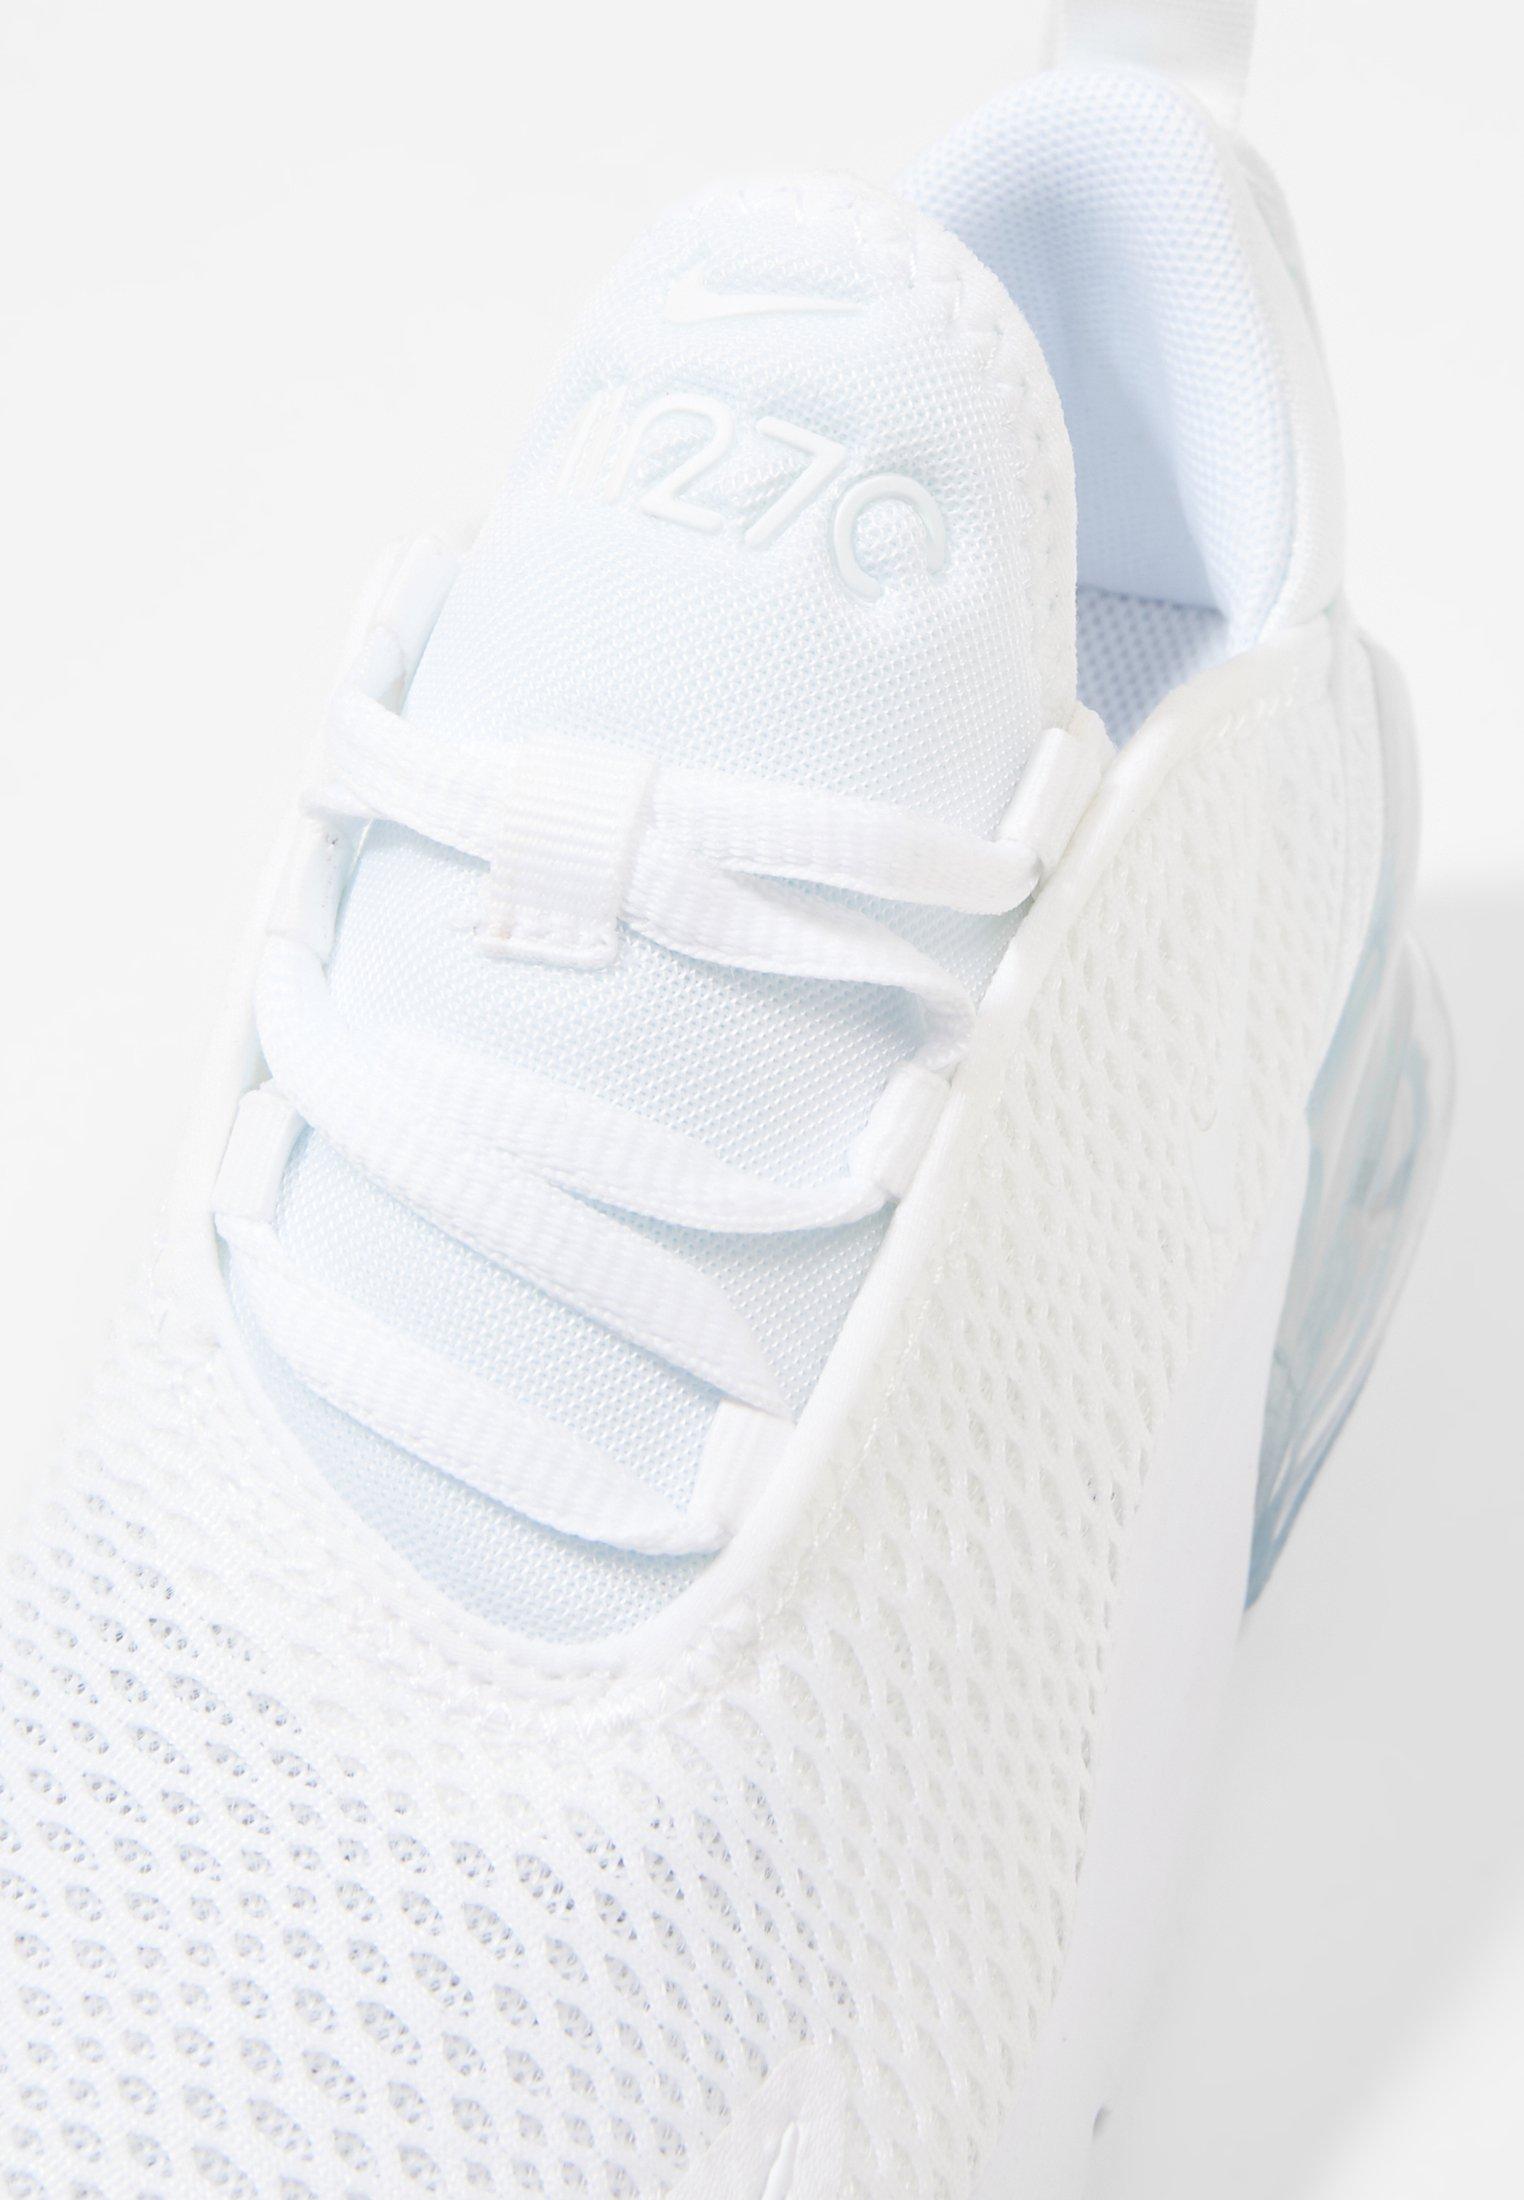 270Baskets mtlc Nike Sportswear white MAX silver AIR basses ymgbvYf76I